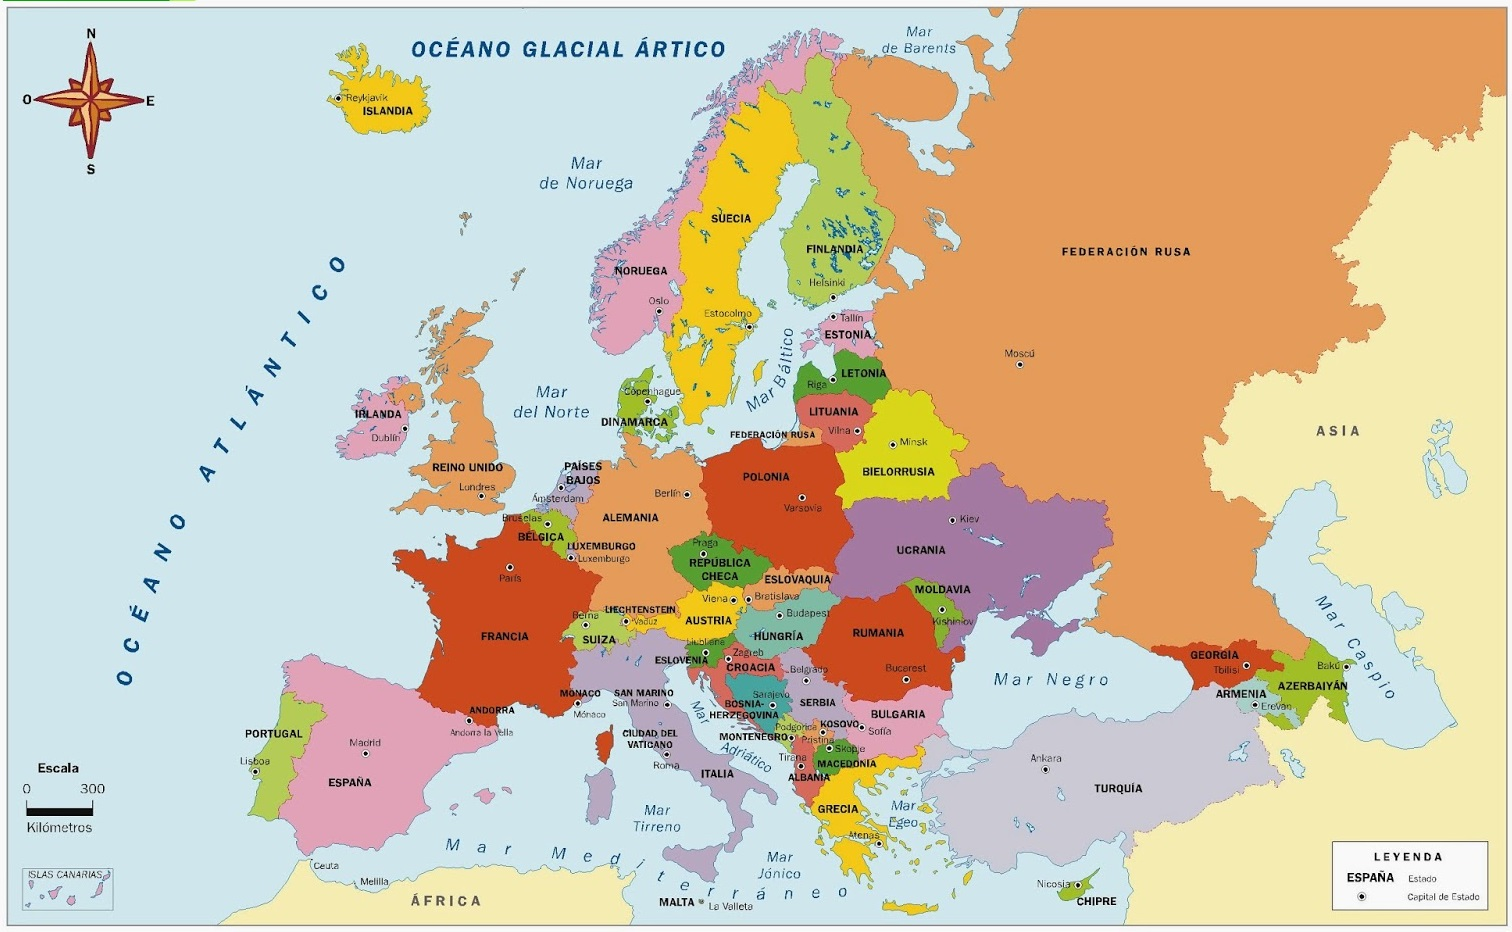 Mapa De Oceania Fisico En Español.Mapa De Europa Para Imprimir Politico Fisico 2019